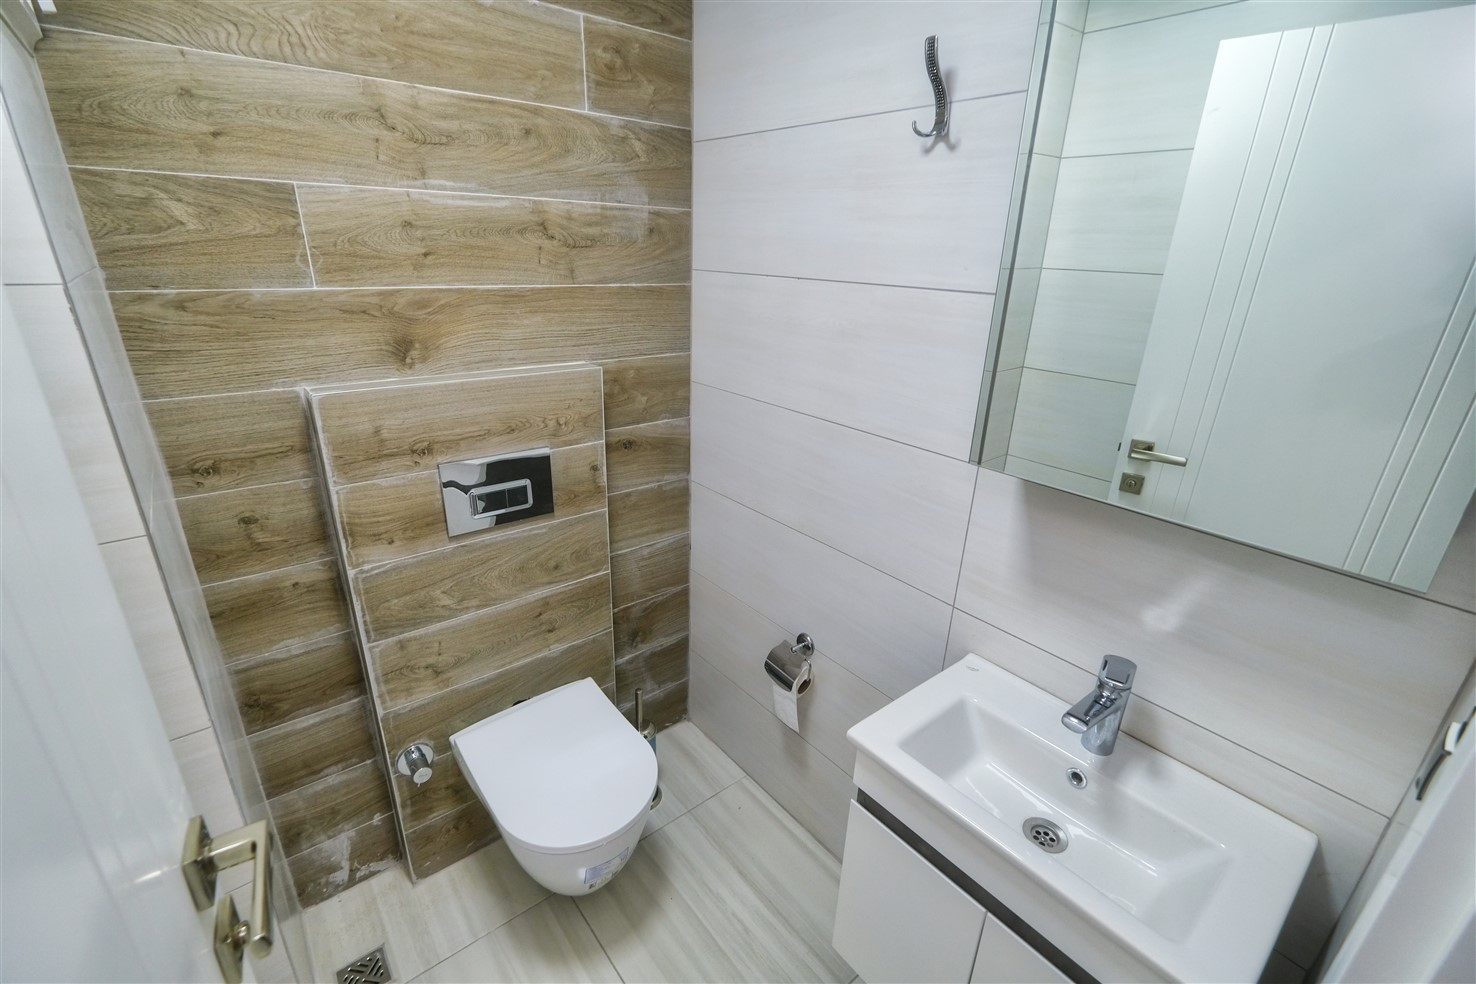 Трёхкомнатная квартира в центре Антальи - Фото 30